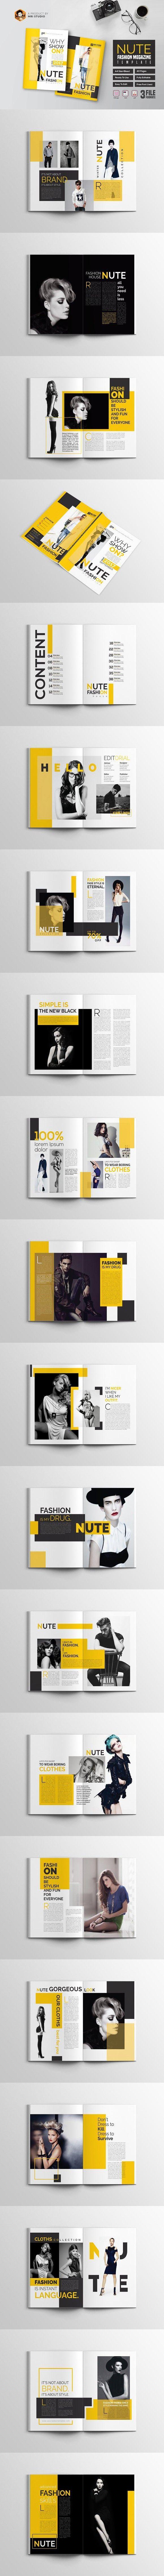 Business infographic : Nute Fashion Magazine Template. Magazine Templates